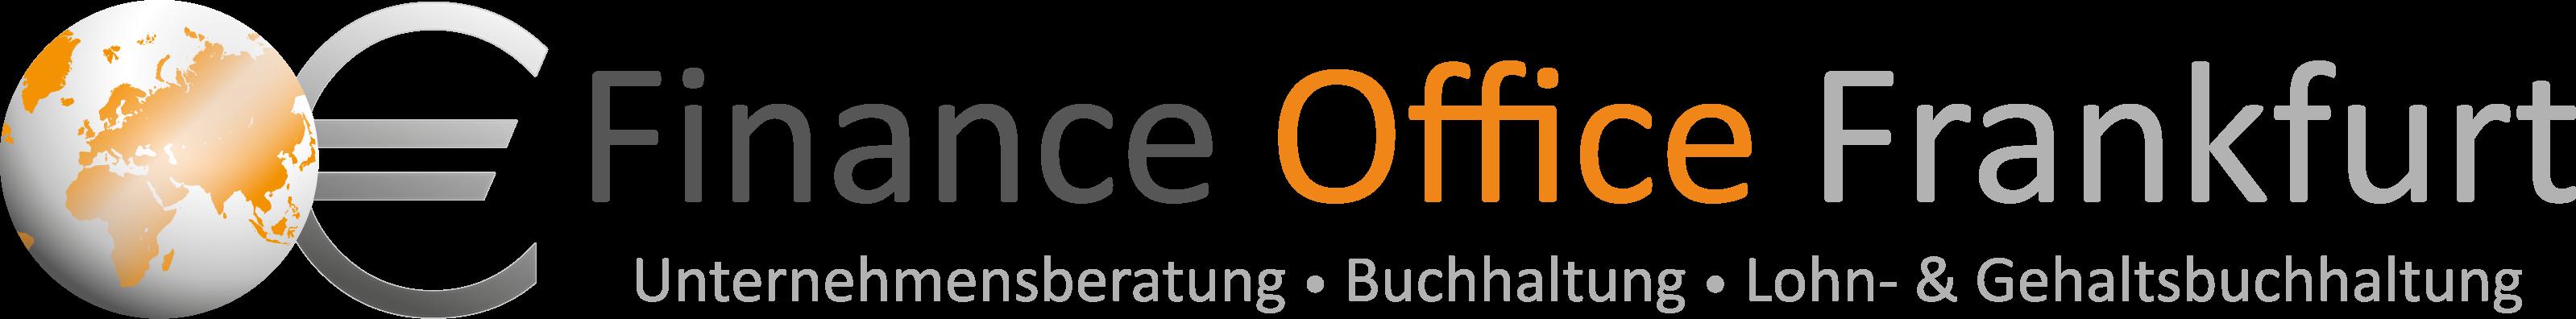 Finance Office Frankfurt GmbH